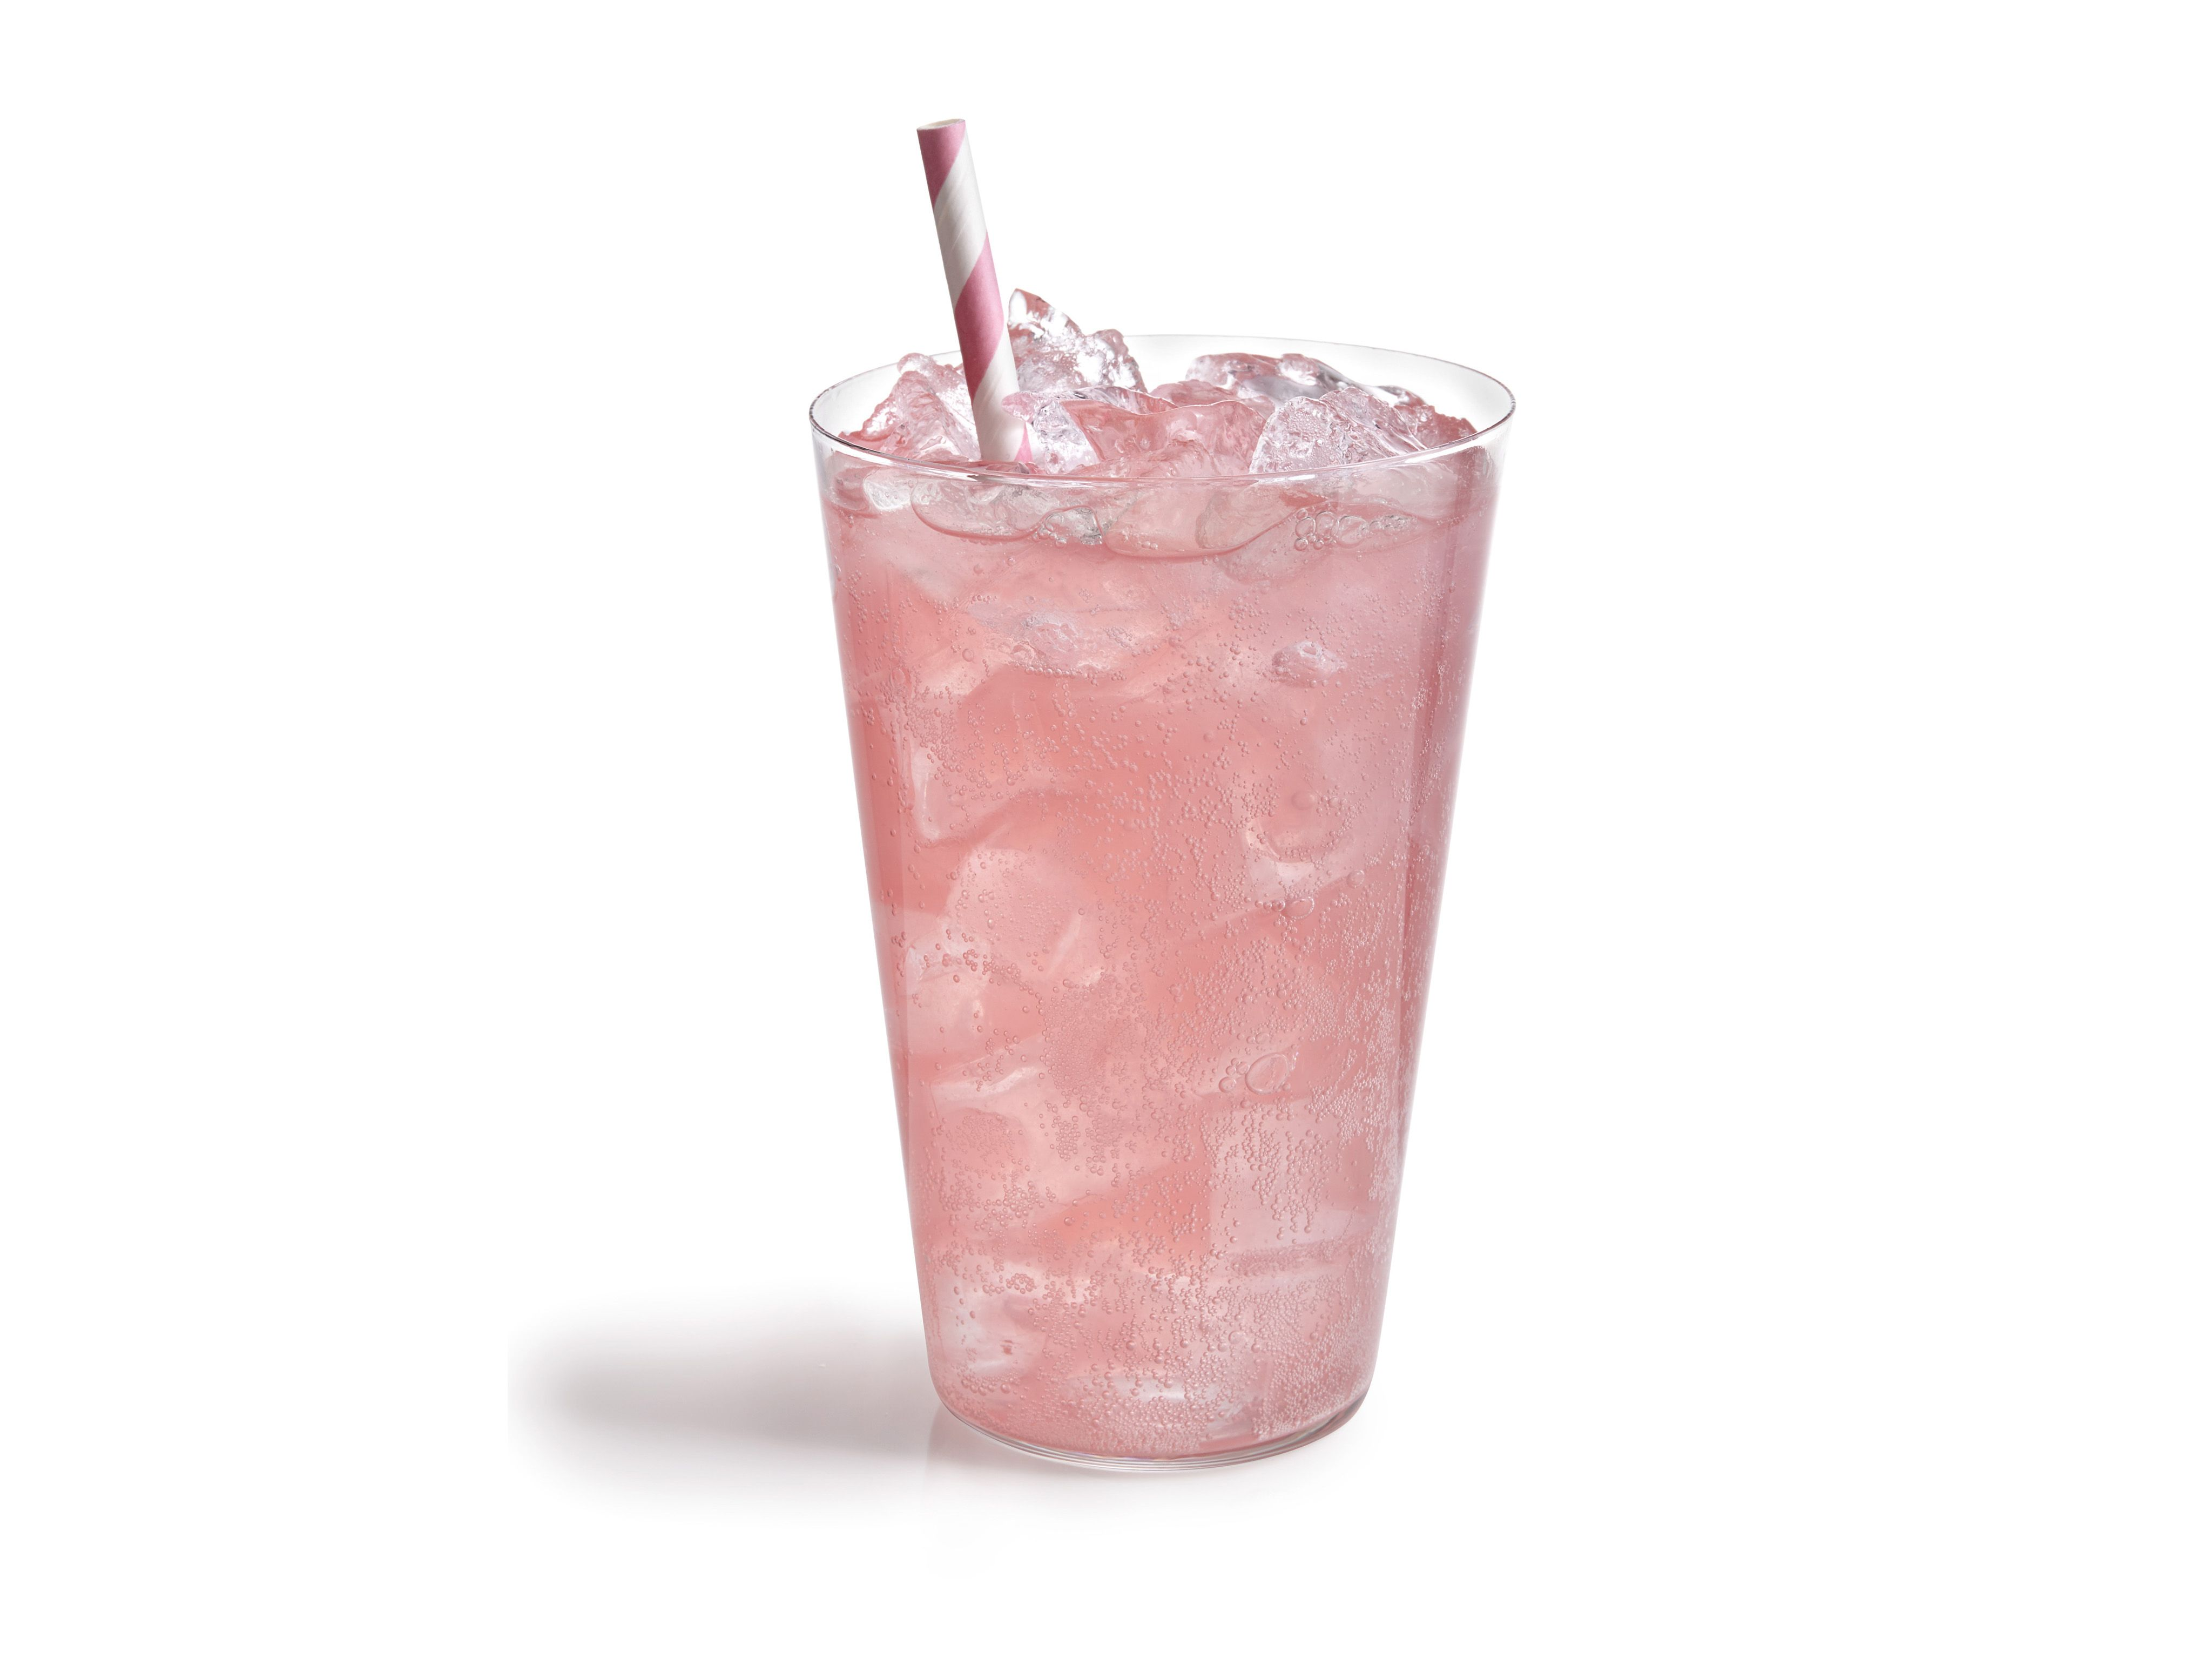 50 homemade sodas soda blackberry and vanilla 50 homemade sodas soda stream recipessoda forumfinder Image collections